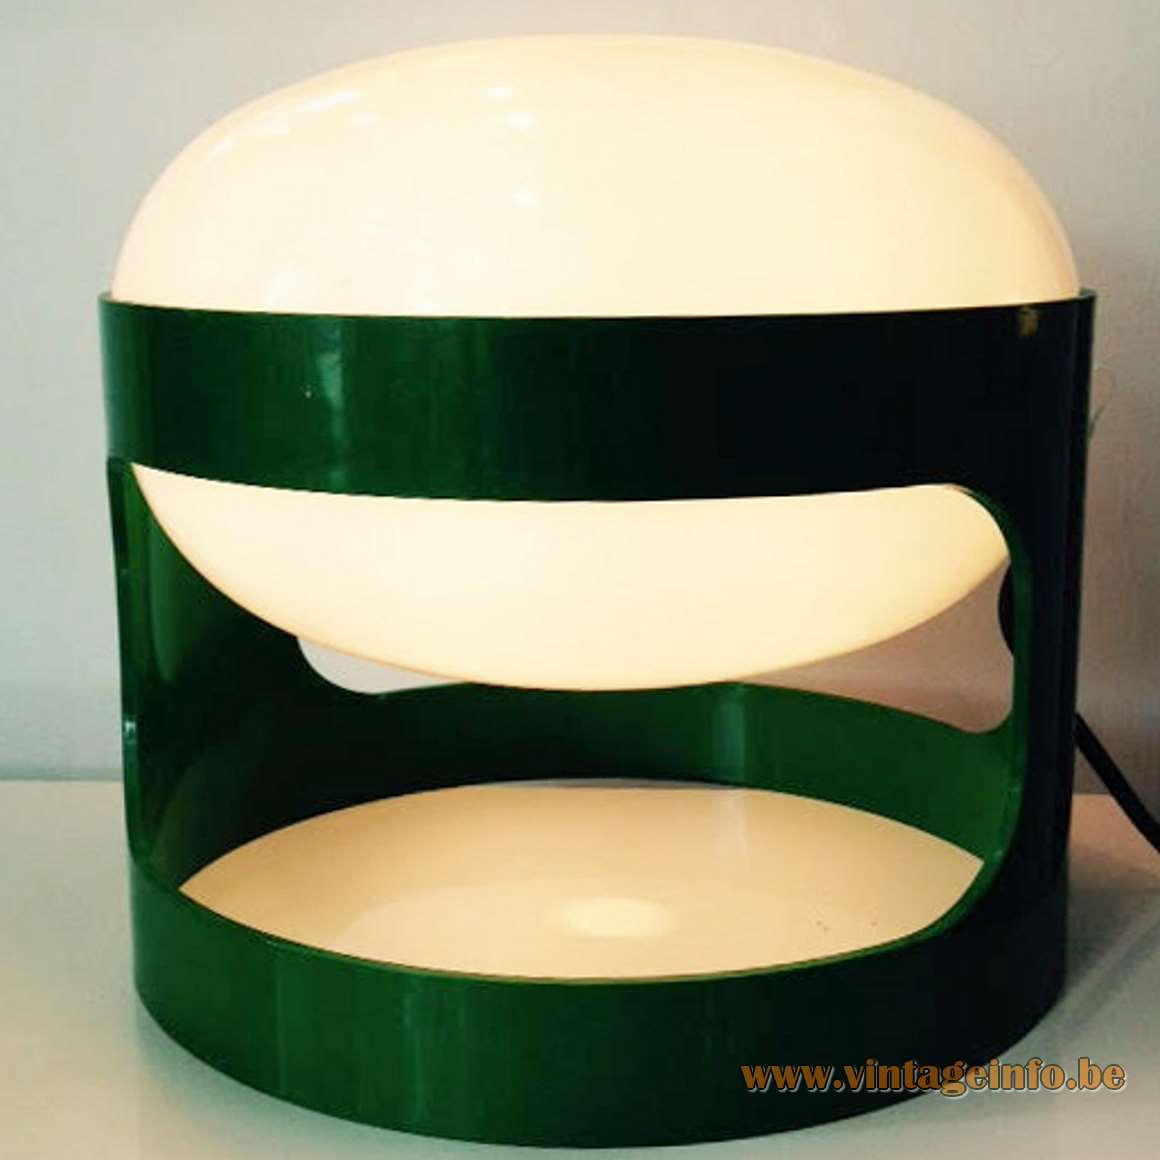 Joe Colombo KD27 Kartell Table Lamp - green